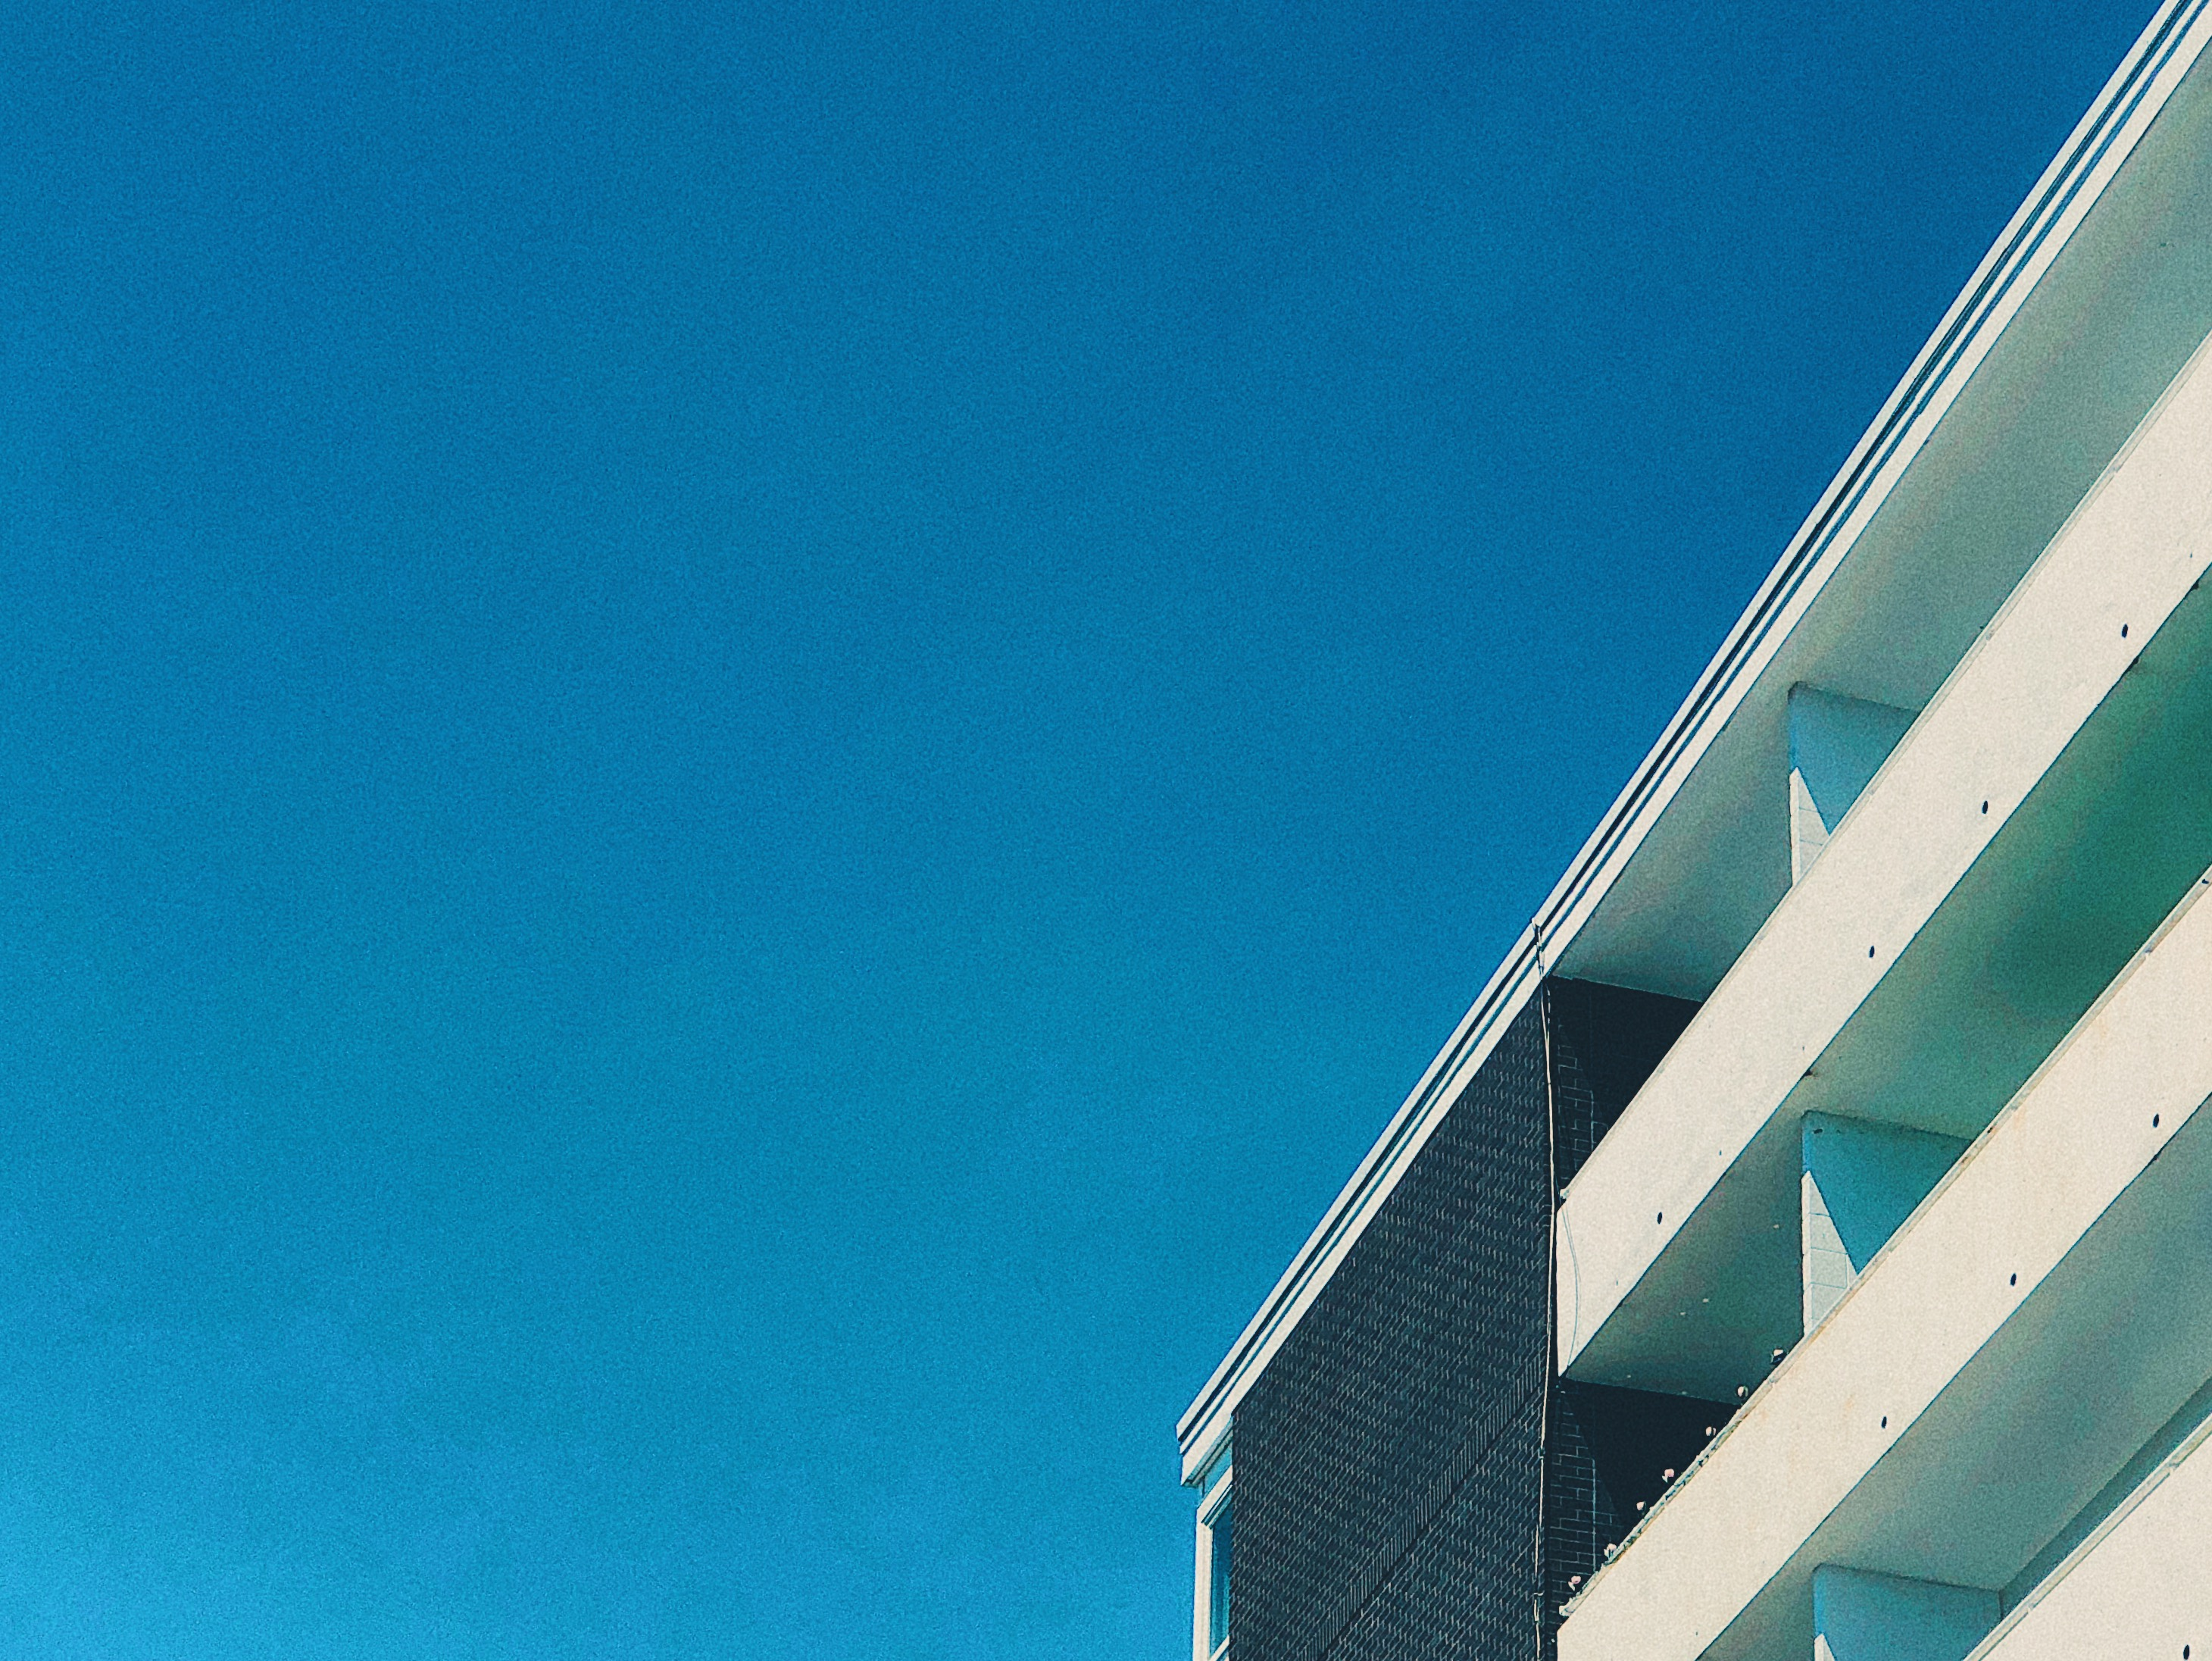 A photograph depicting Saint John Apartment Building Edge